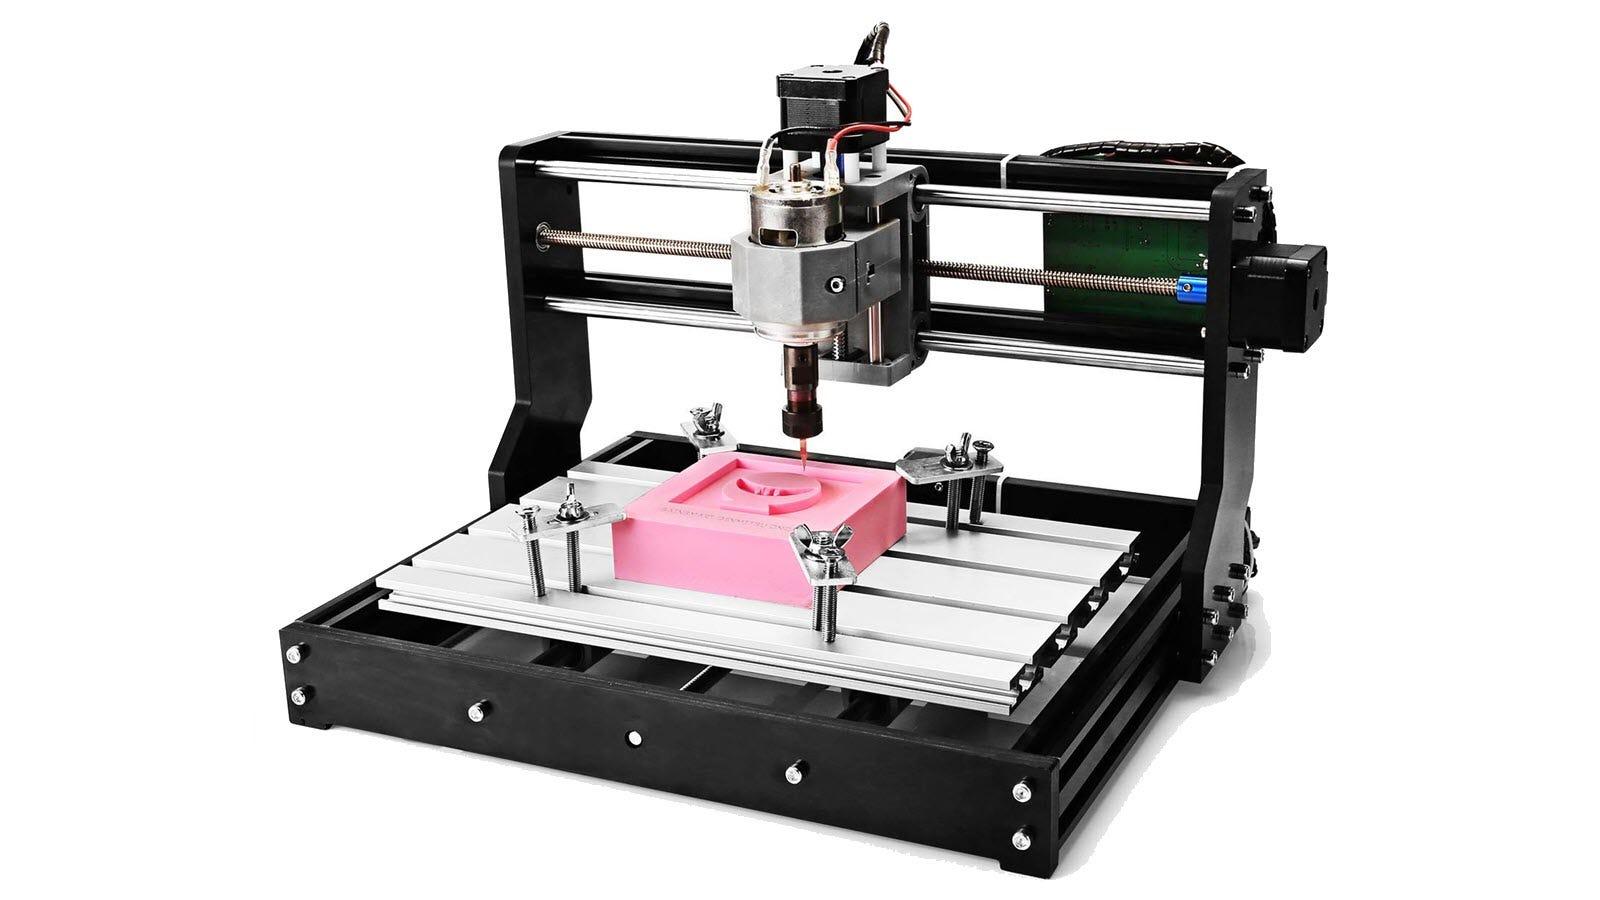 A Genmitsu CNC 3018-PRO cutting a shape into pink foam.